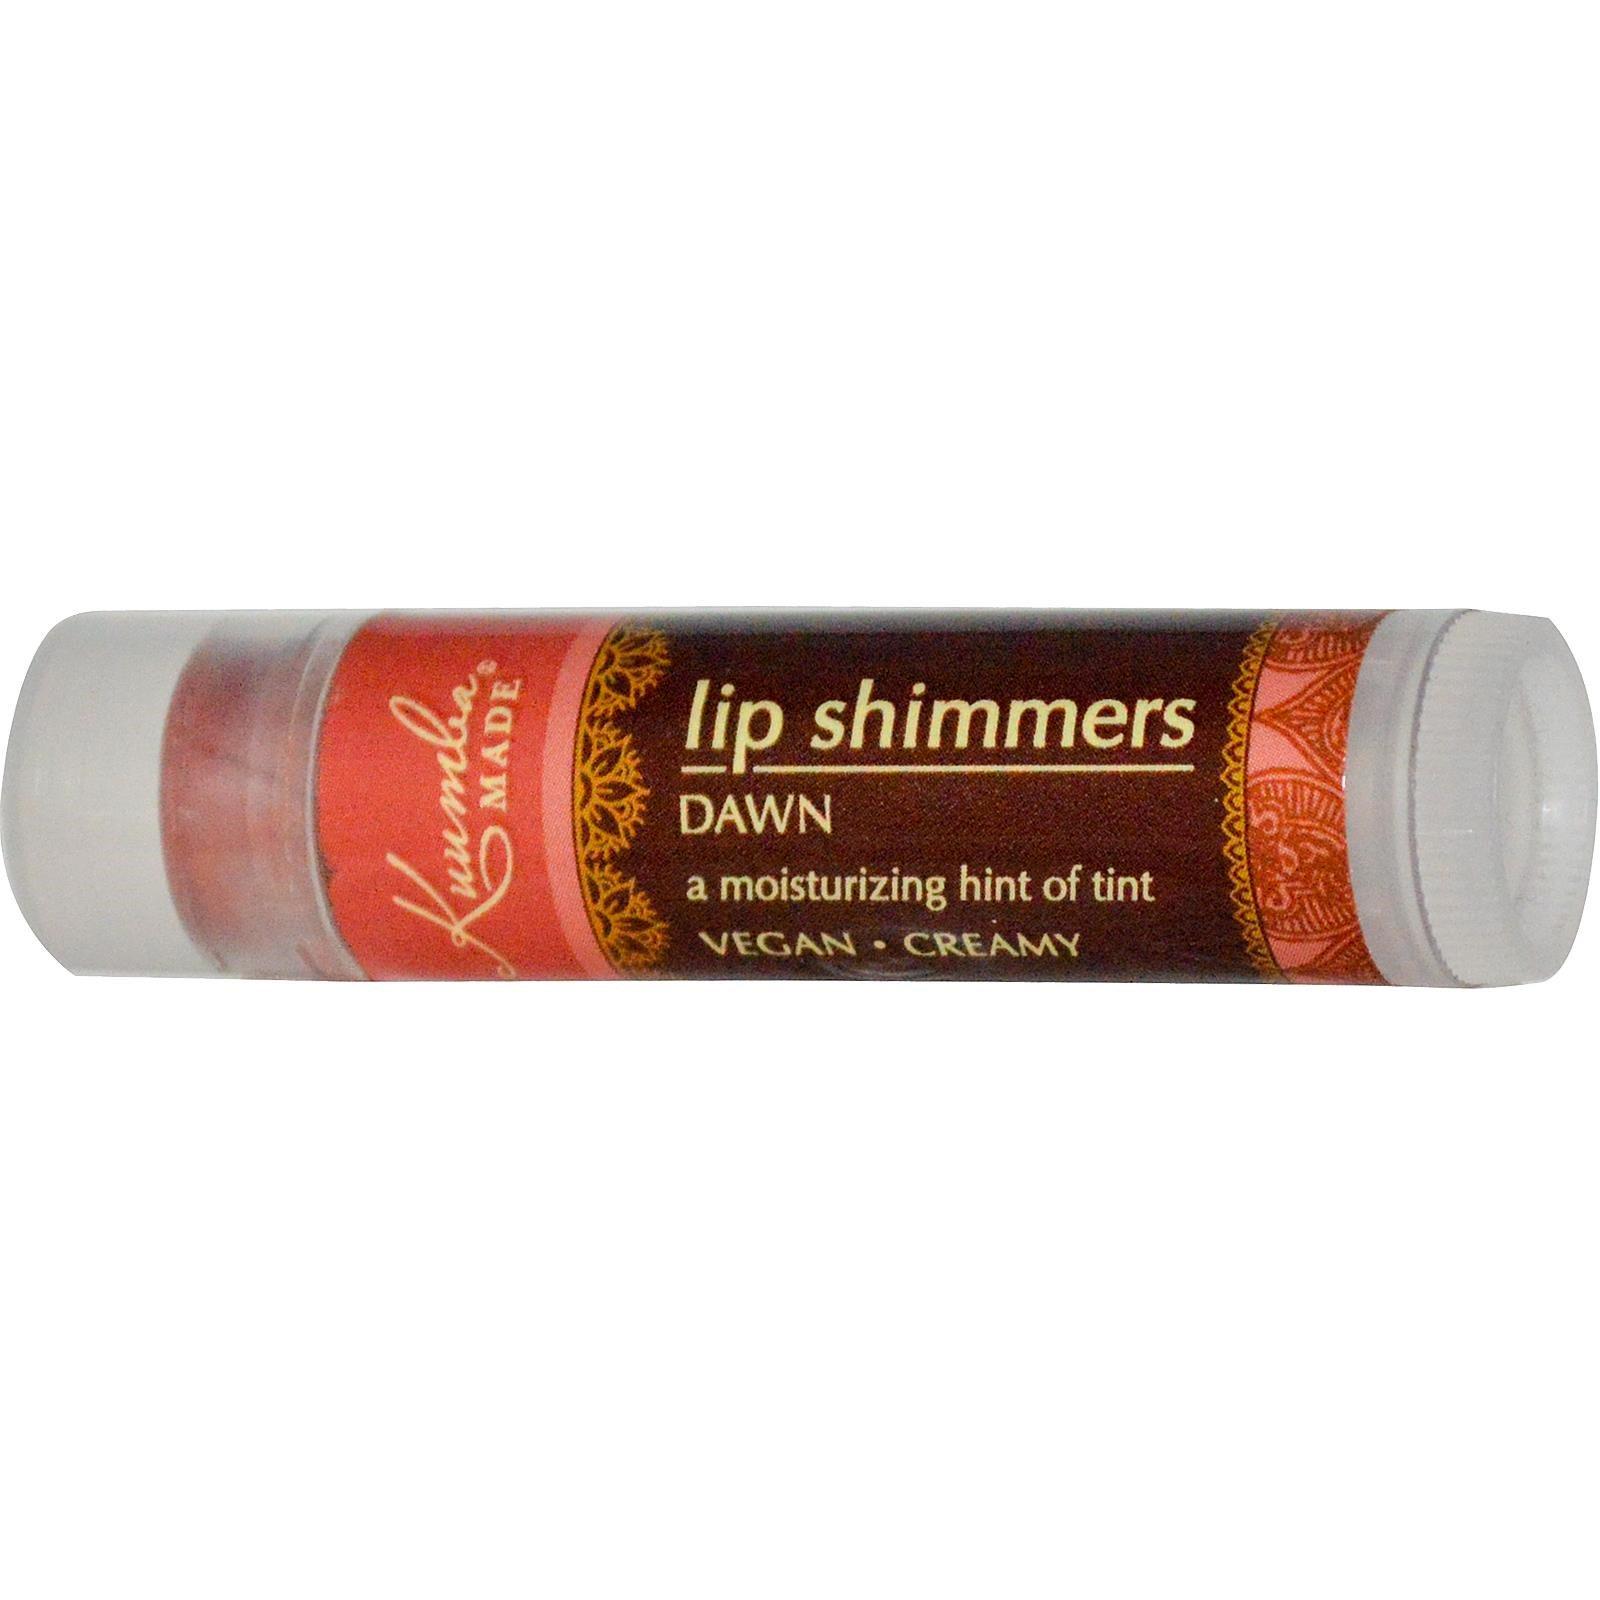 Kuumba Made, Шиммер для губ, оттенок Dawn, 0.15 унций (4.25 г)